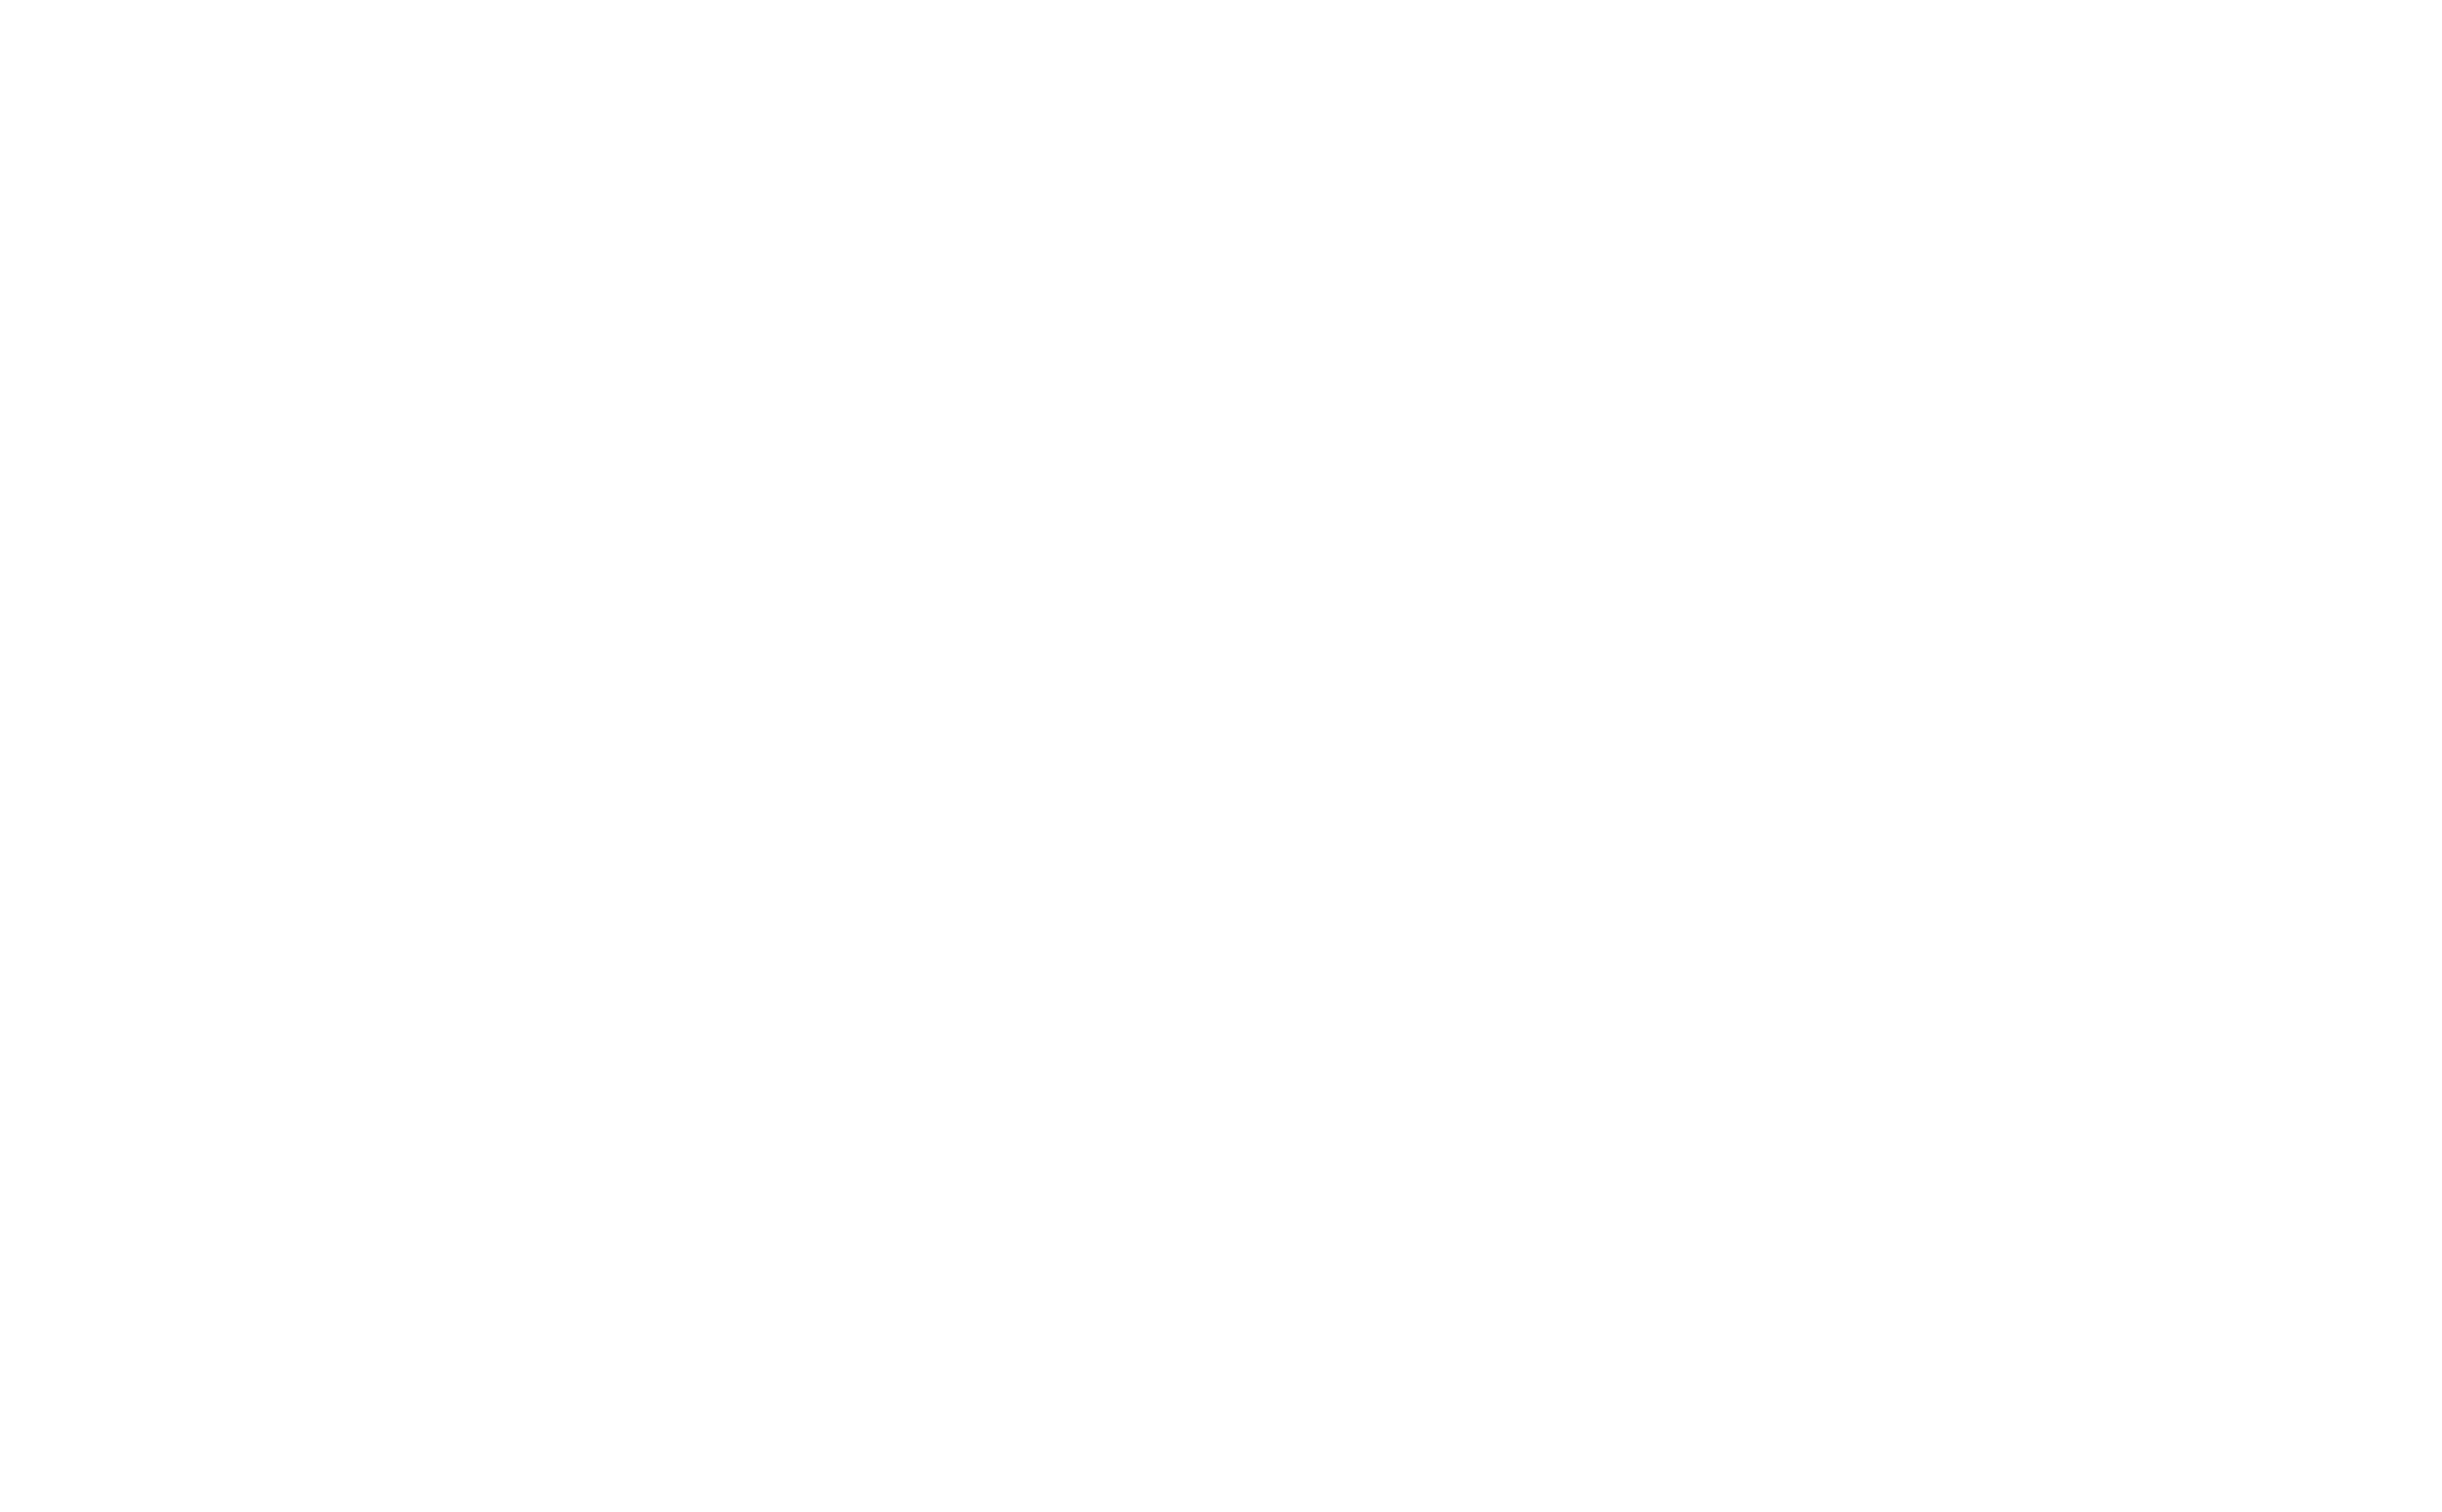 2019-CapitalCityFilmFestival-Laurels white.png